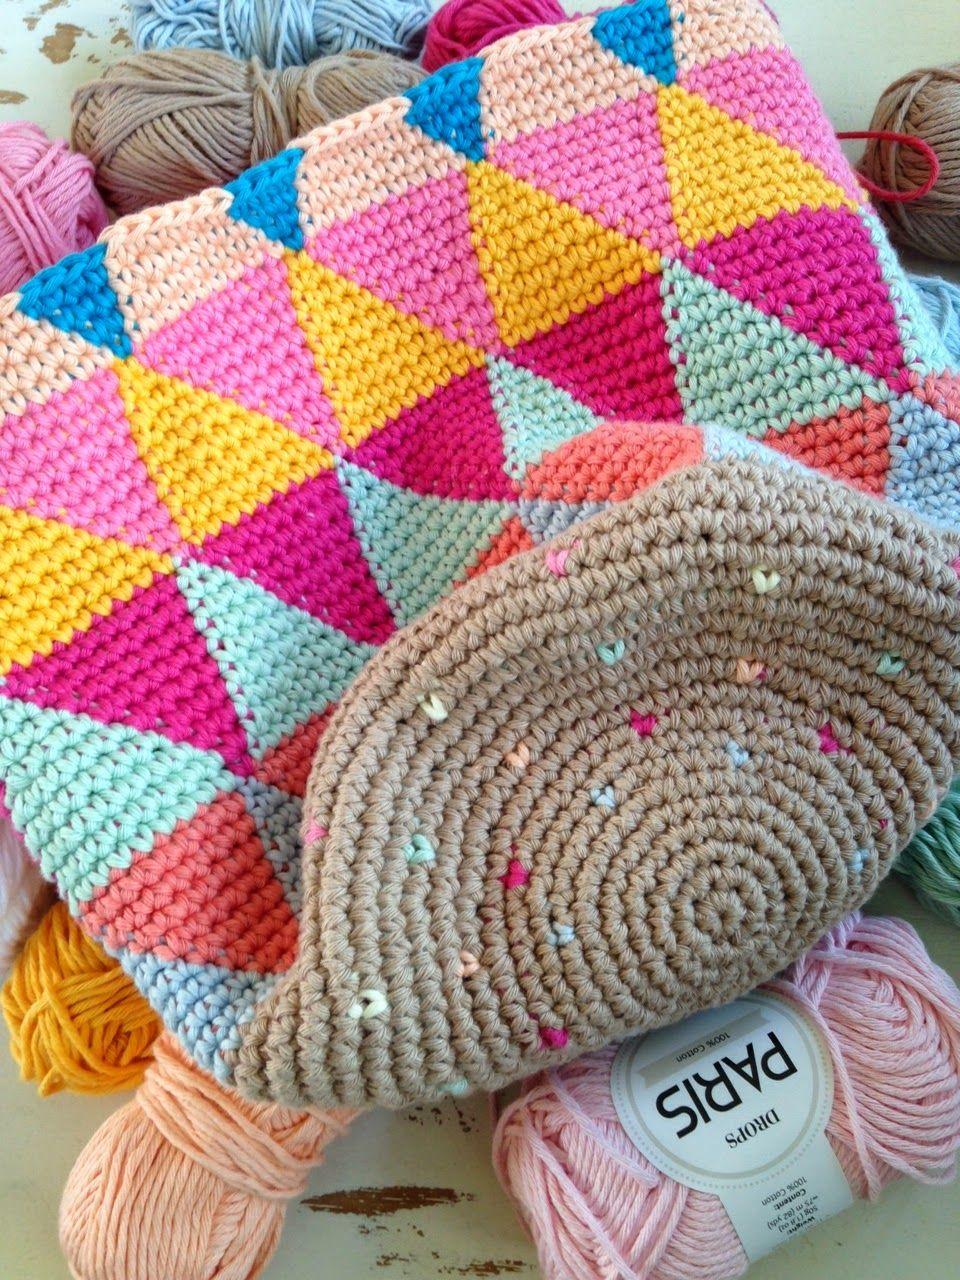 crochet tapestry bag inspiration only crochet. Black Bedroom Furniture Sets. Home Design Ideas